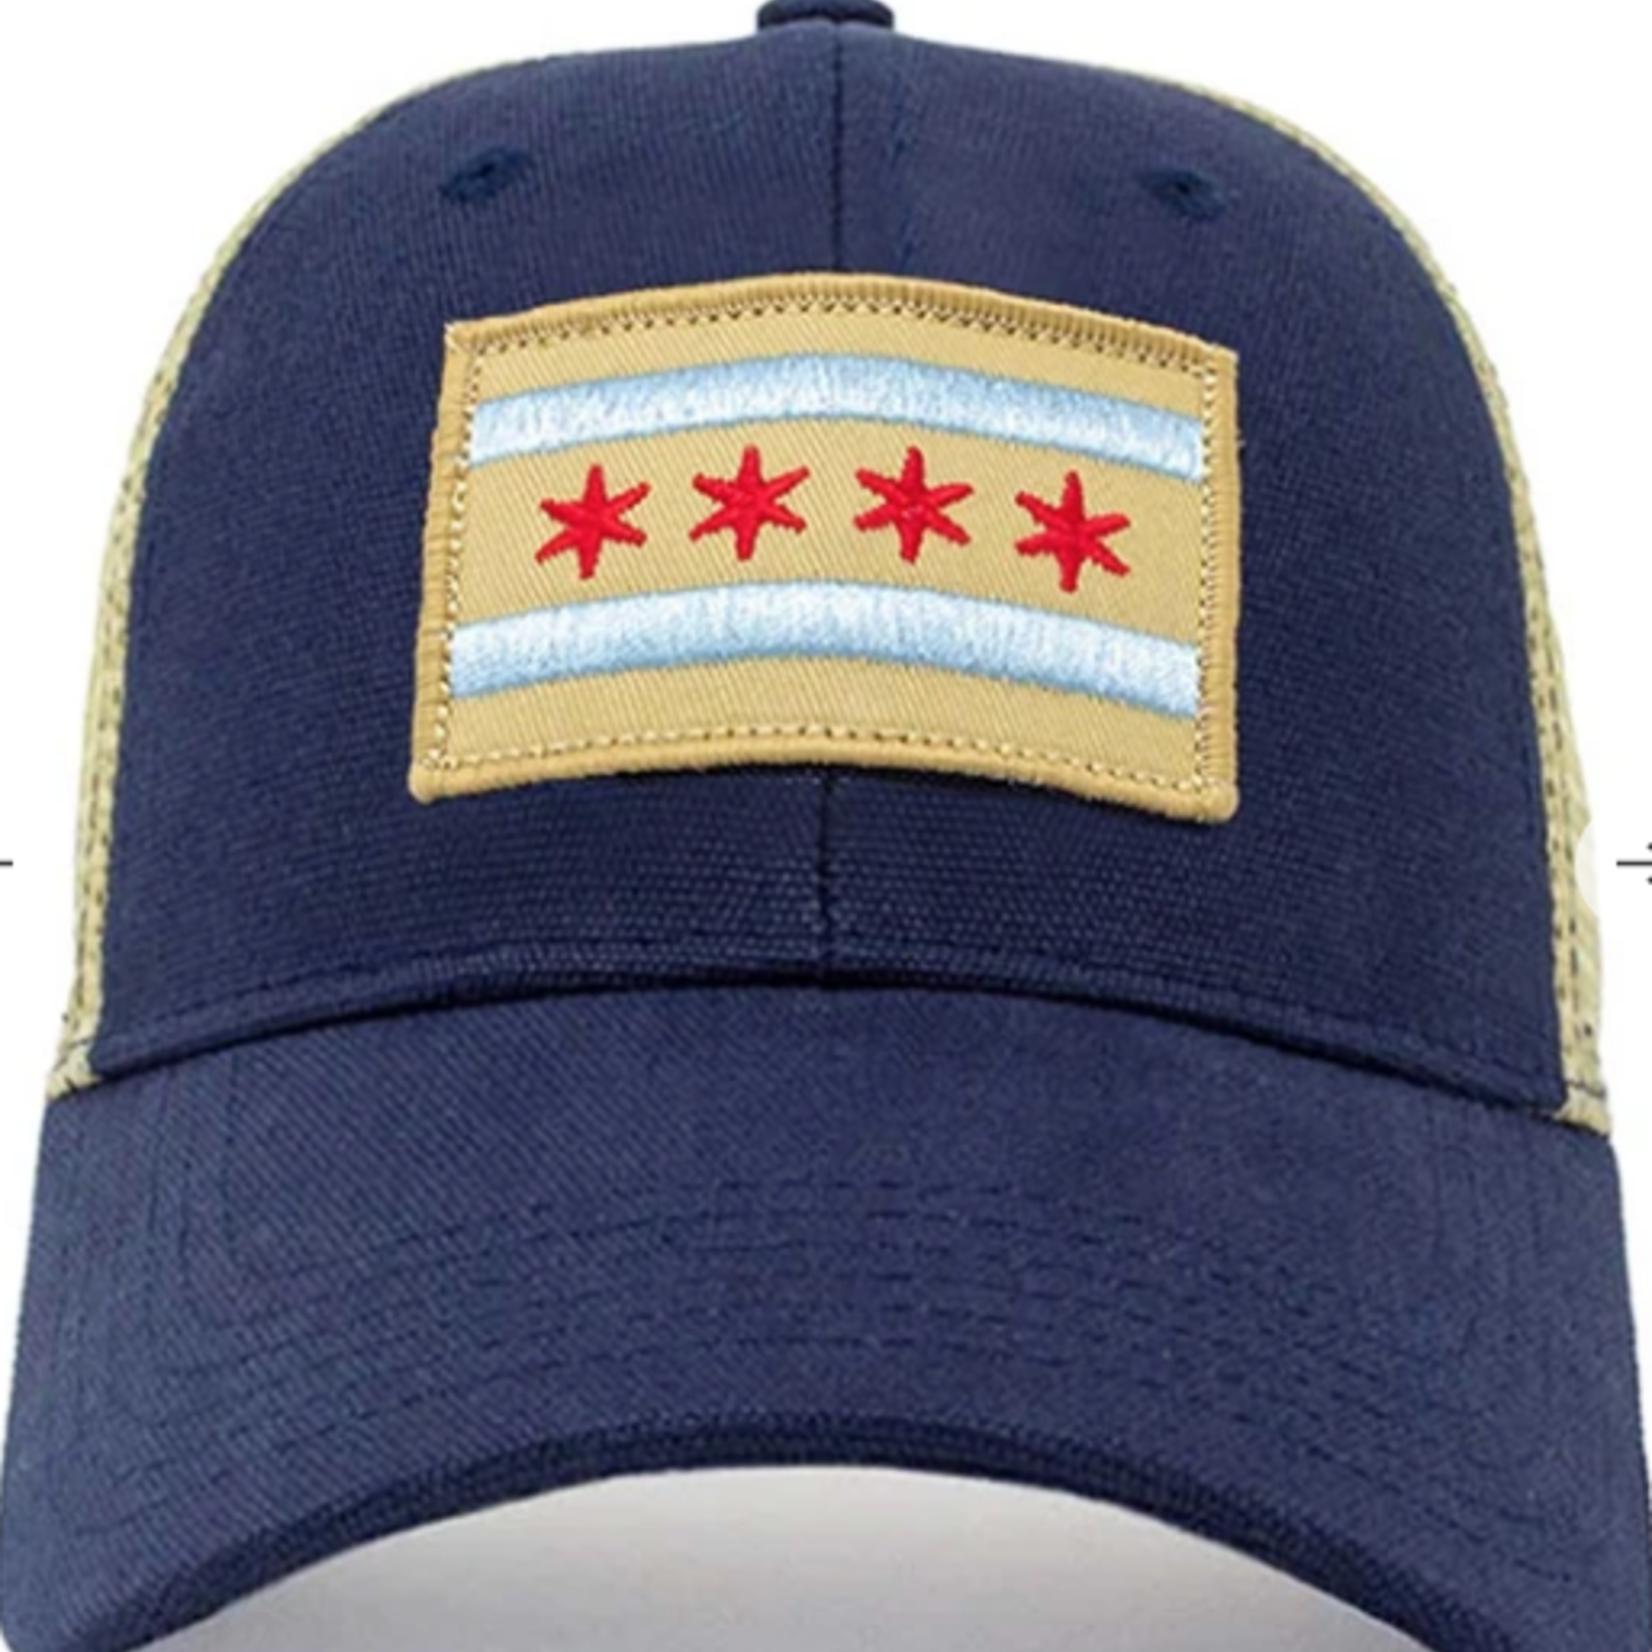 Civil Standard Chicago Mesh Snapback-Navy-O/S